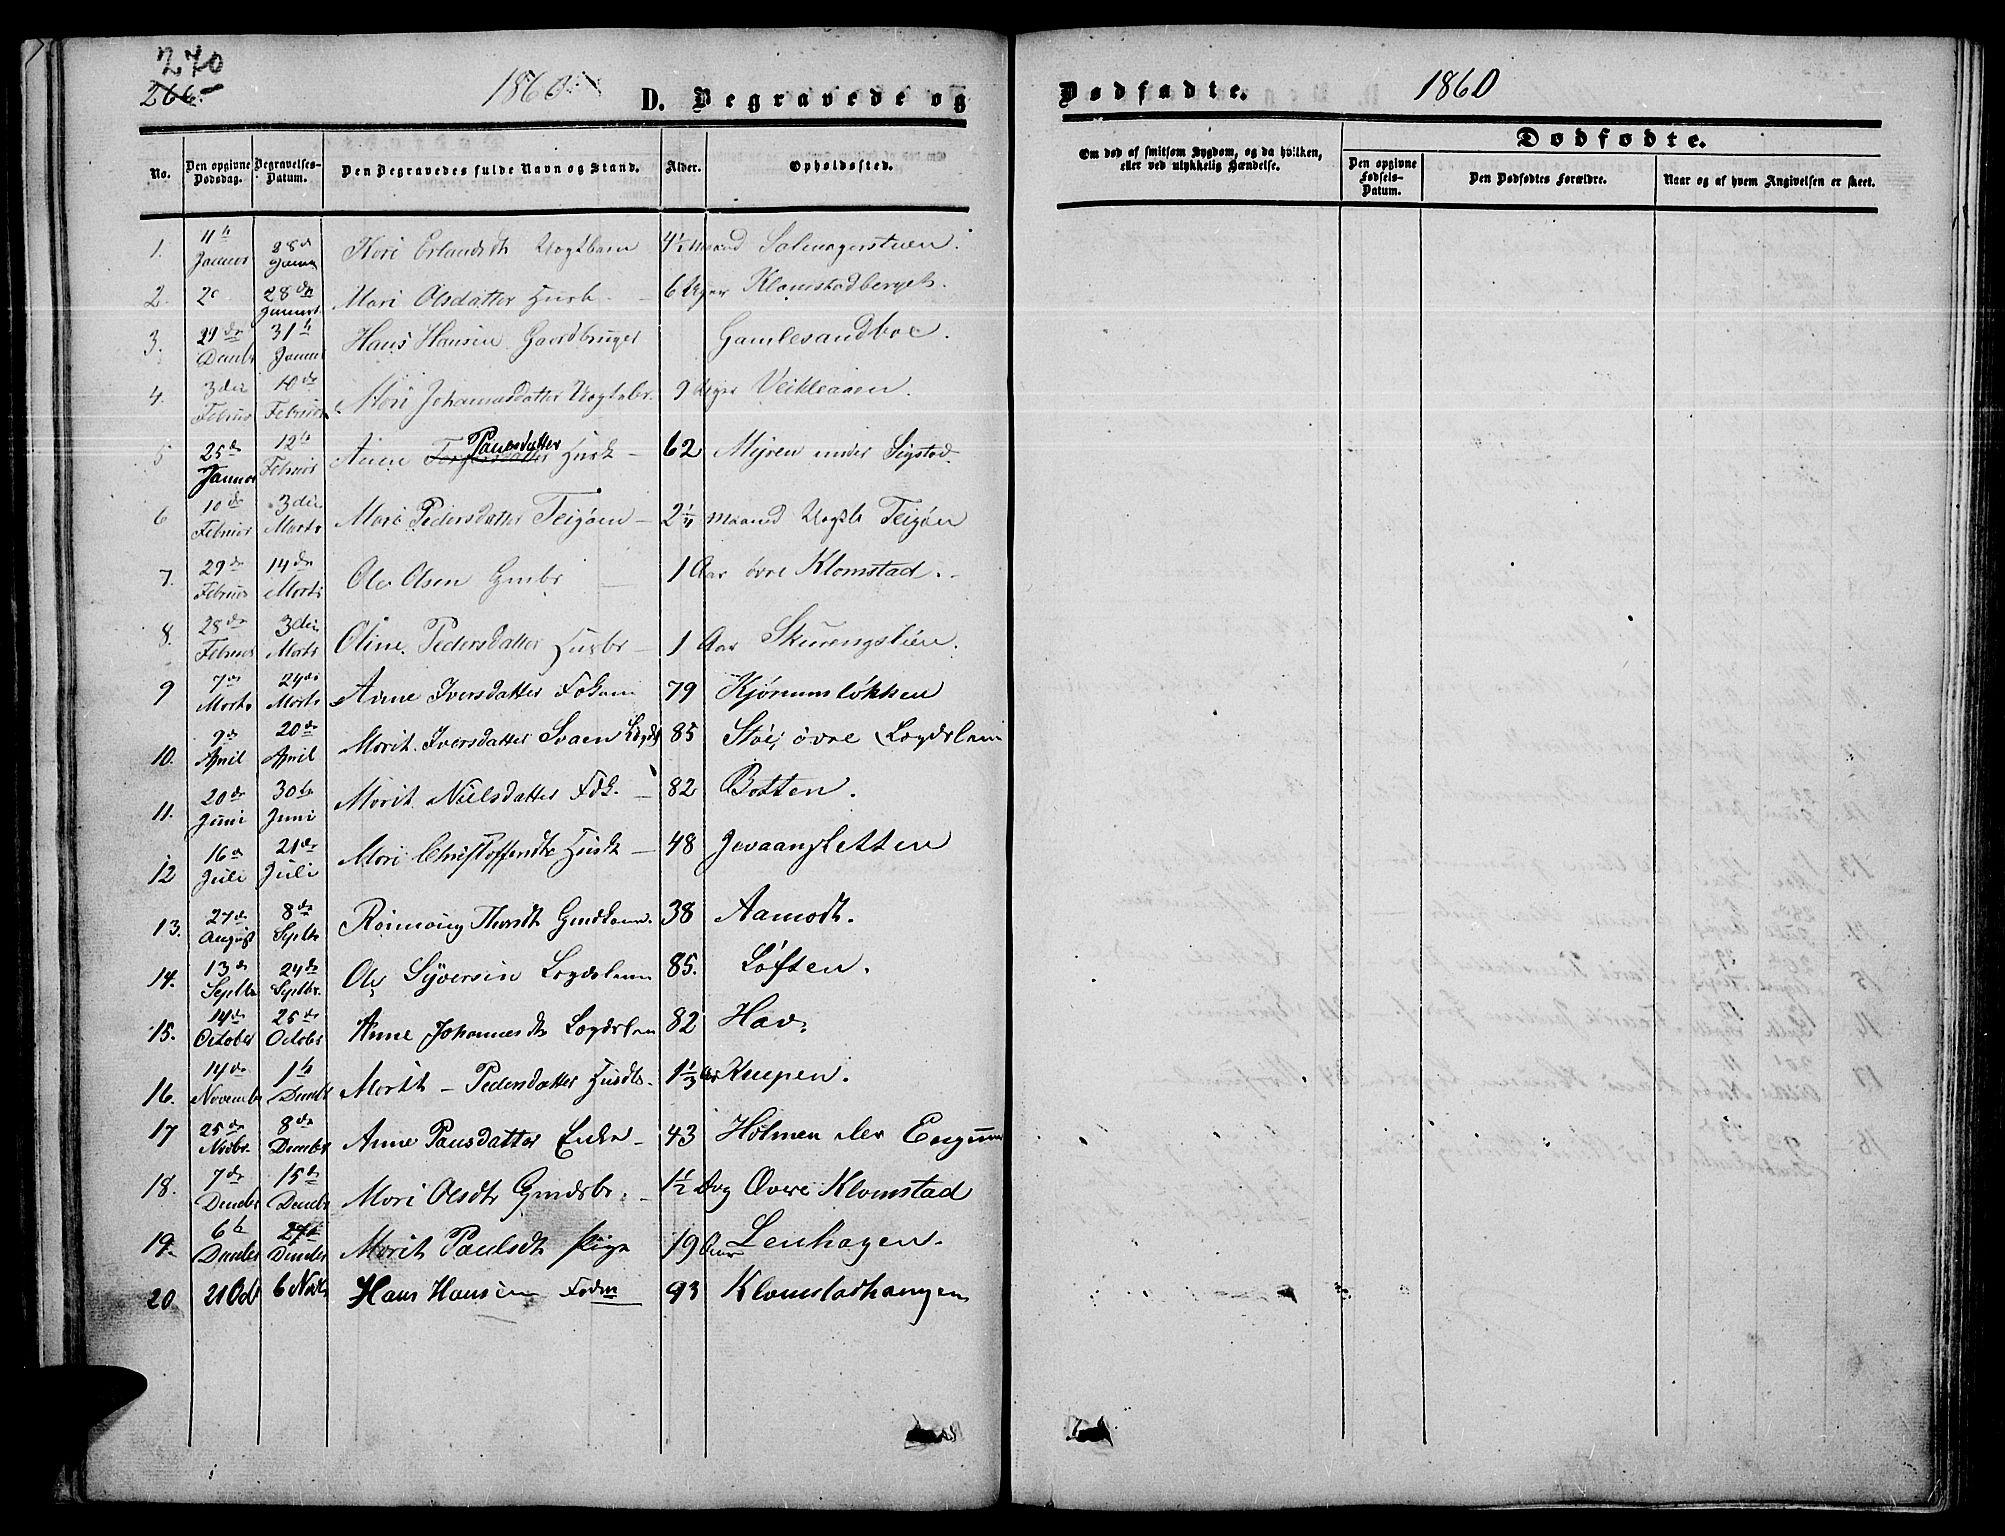 SAH, Nord-Fron prestekontor, Klokkerbok nr. 3, 1851-1886, s. 270